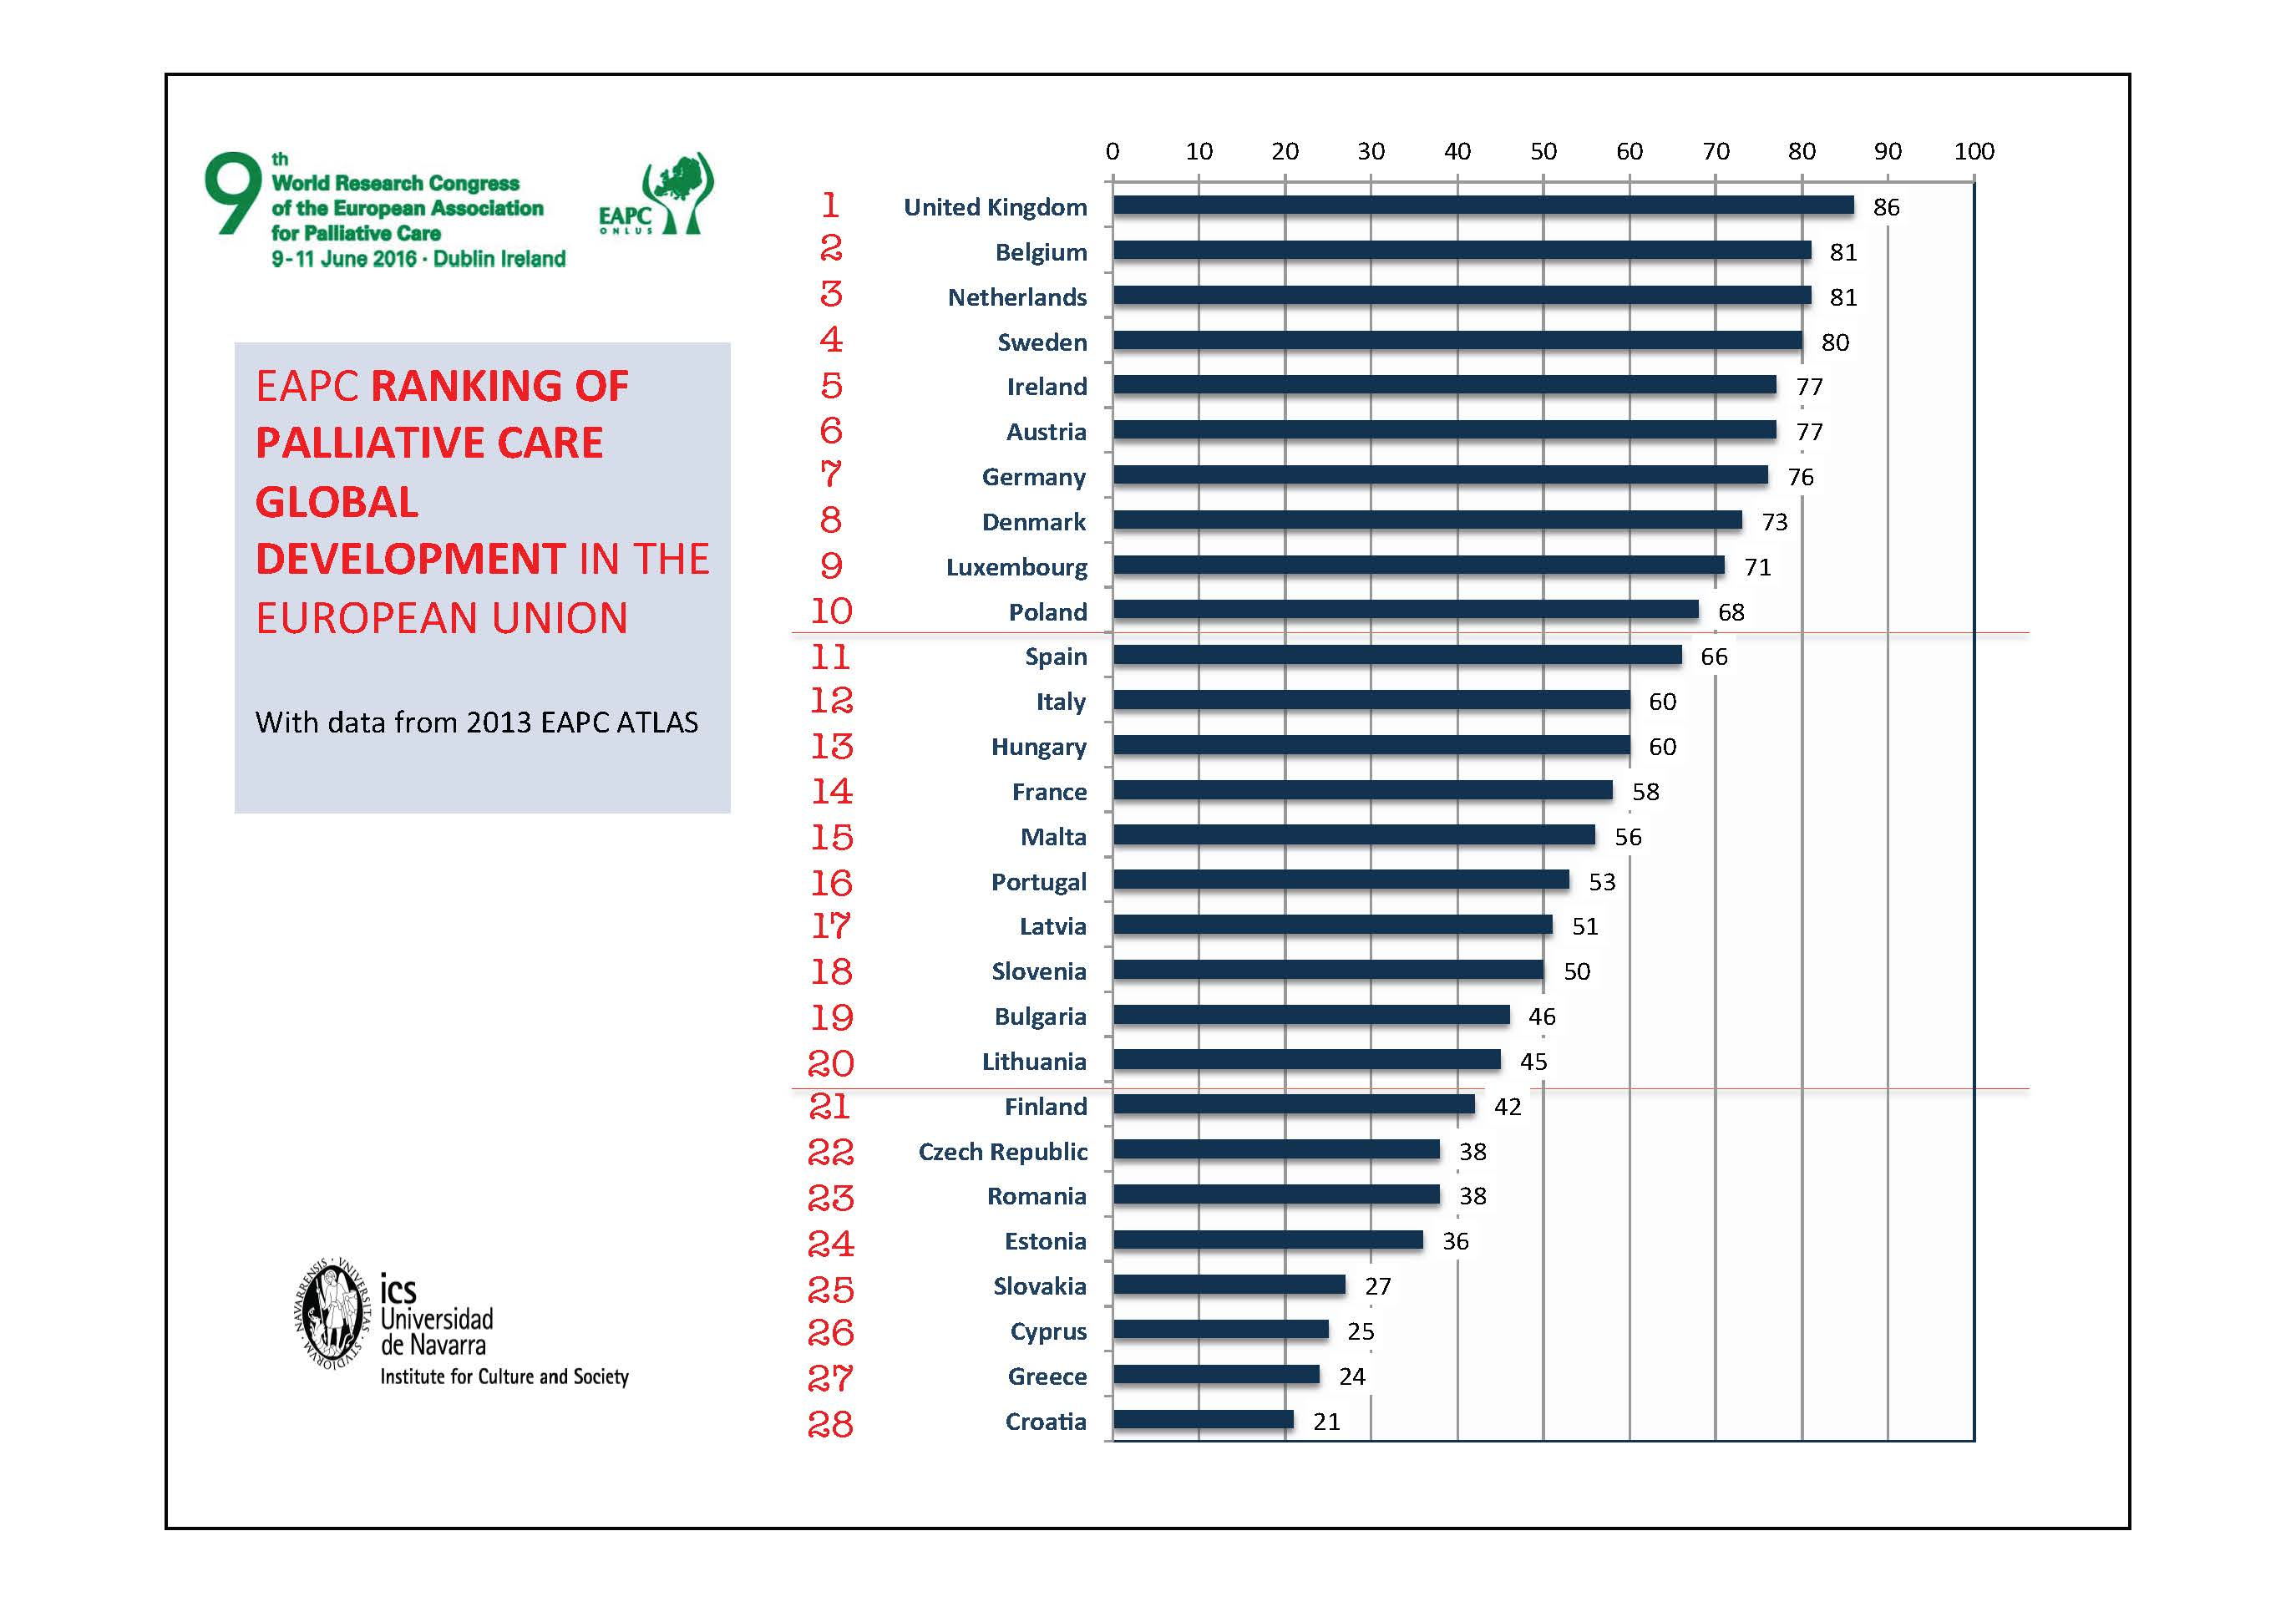 Ireland ranked in EU top five for palliative care